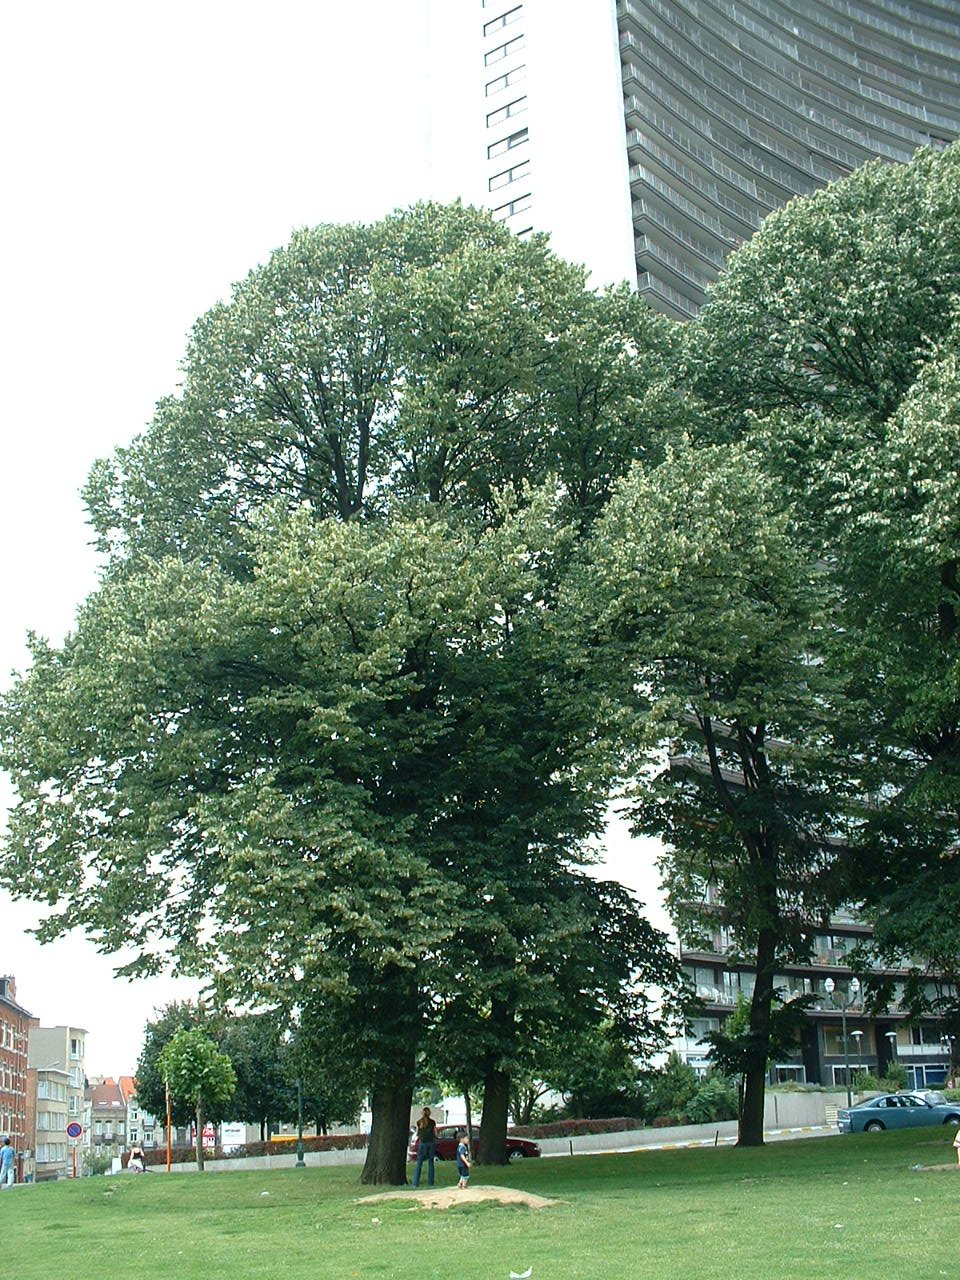 Tilleul argenté – Schaerbeek, Avenue Louis Bertrand –  09 Juillet 2002